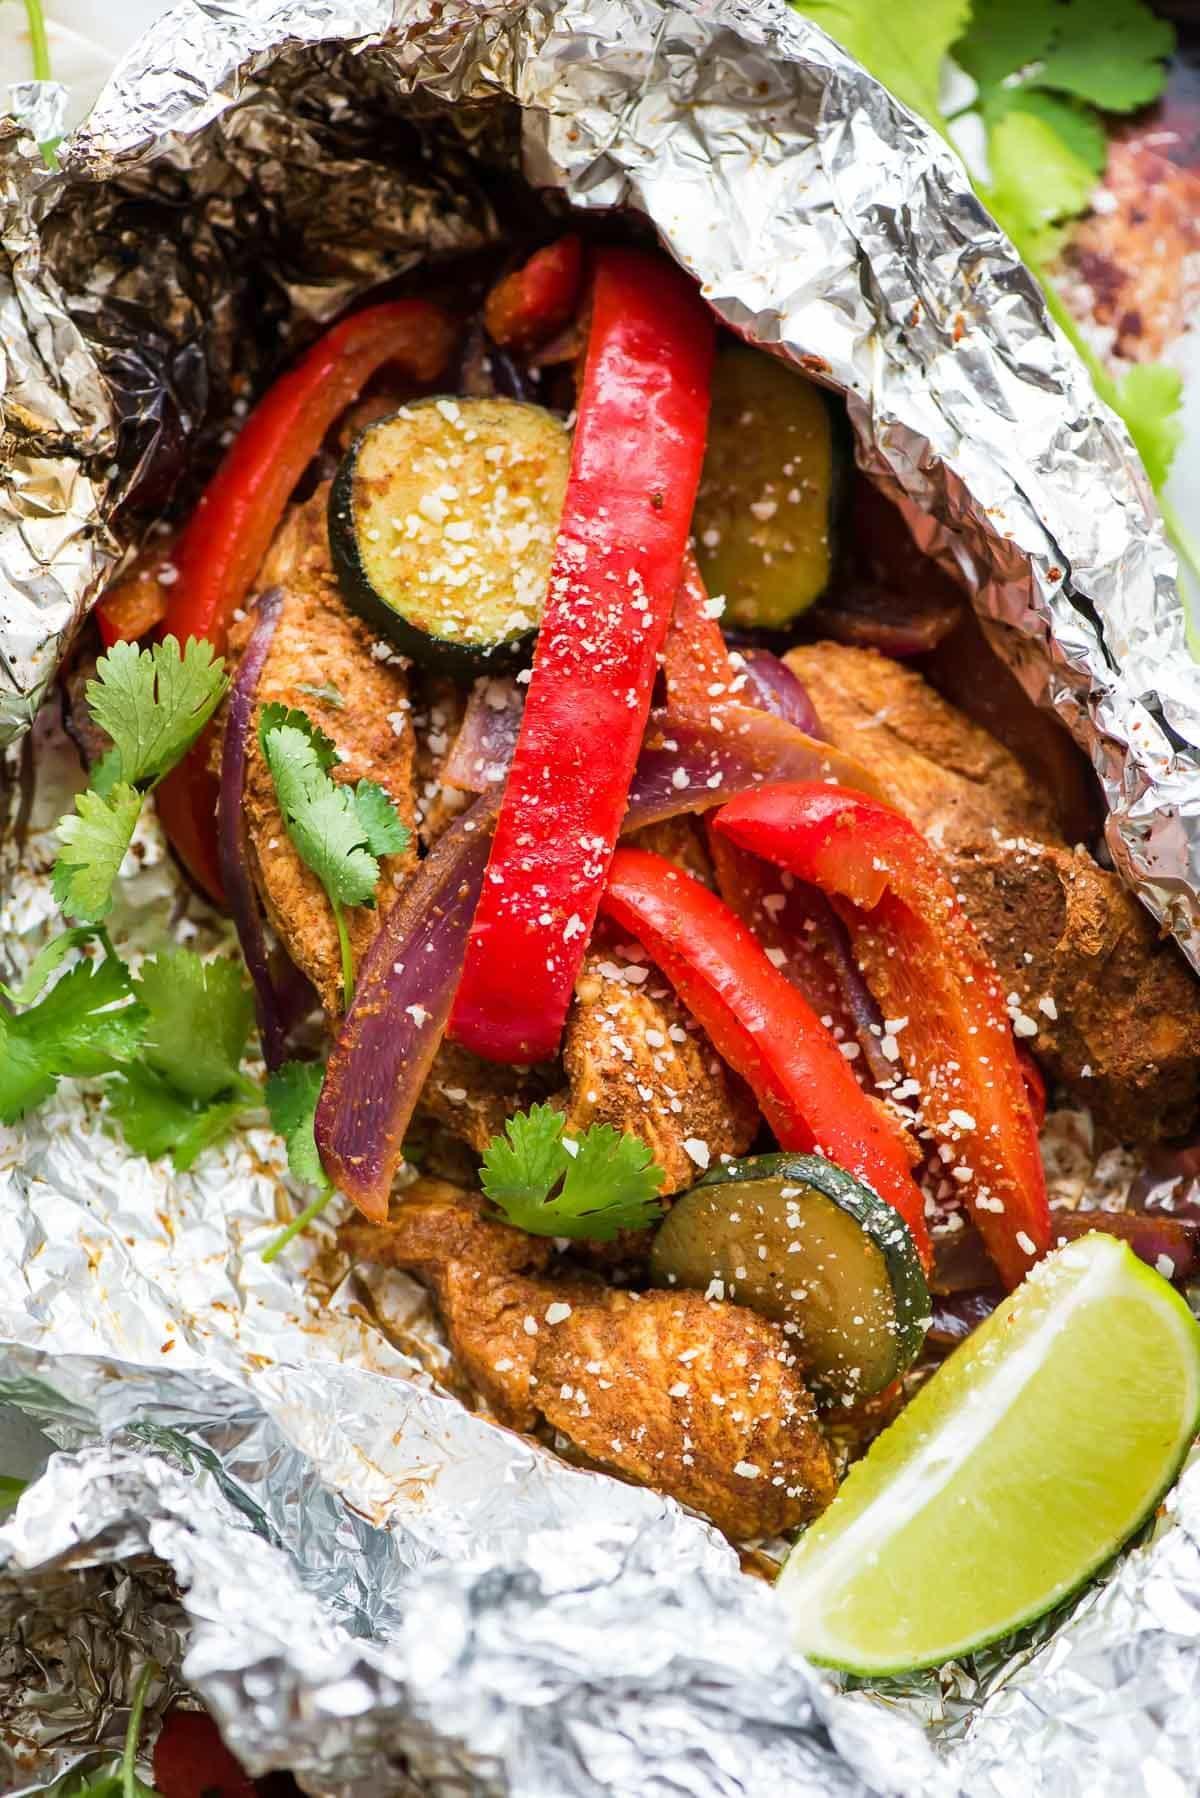 keto-camping-recipes-Grilled-Chicken-Fajitas-600x899@2x.jpg